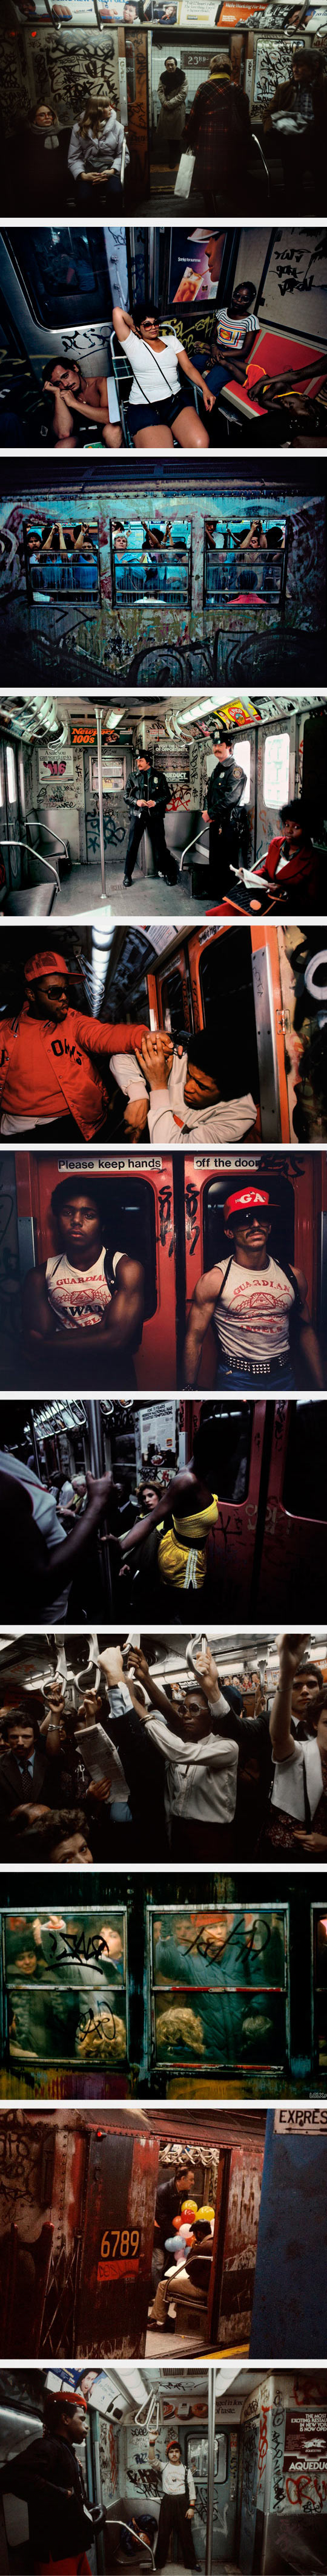 New York City Subway Photos Taken In The 80s